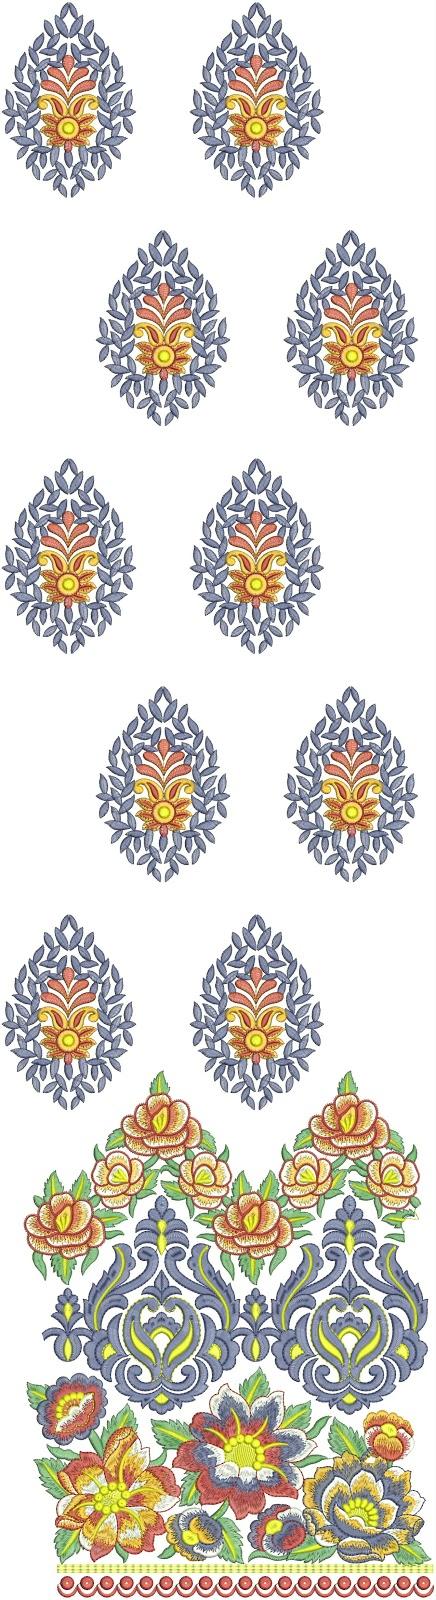 Stylish Fashionable Churidar Salwar Kameez Embroidery